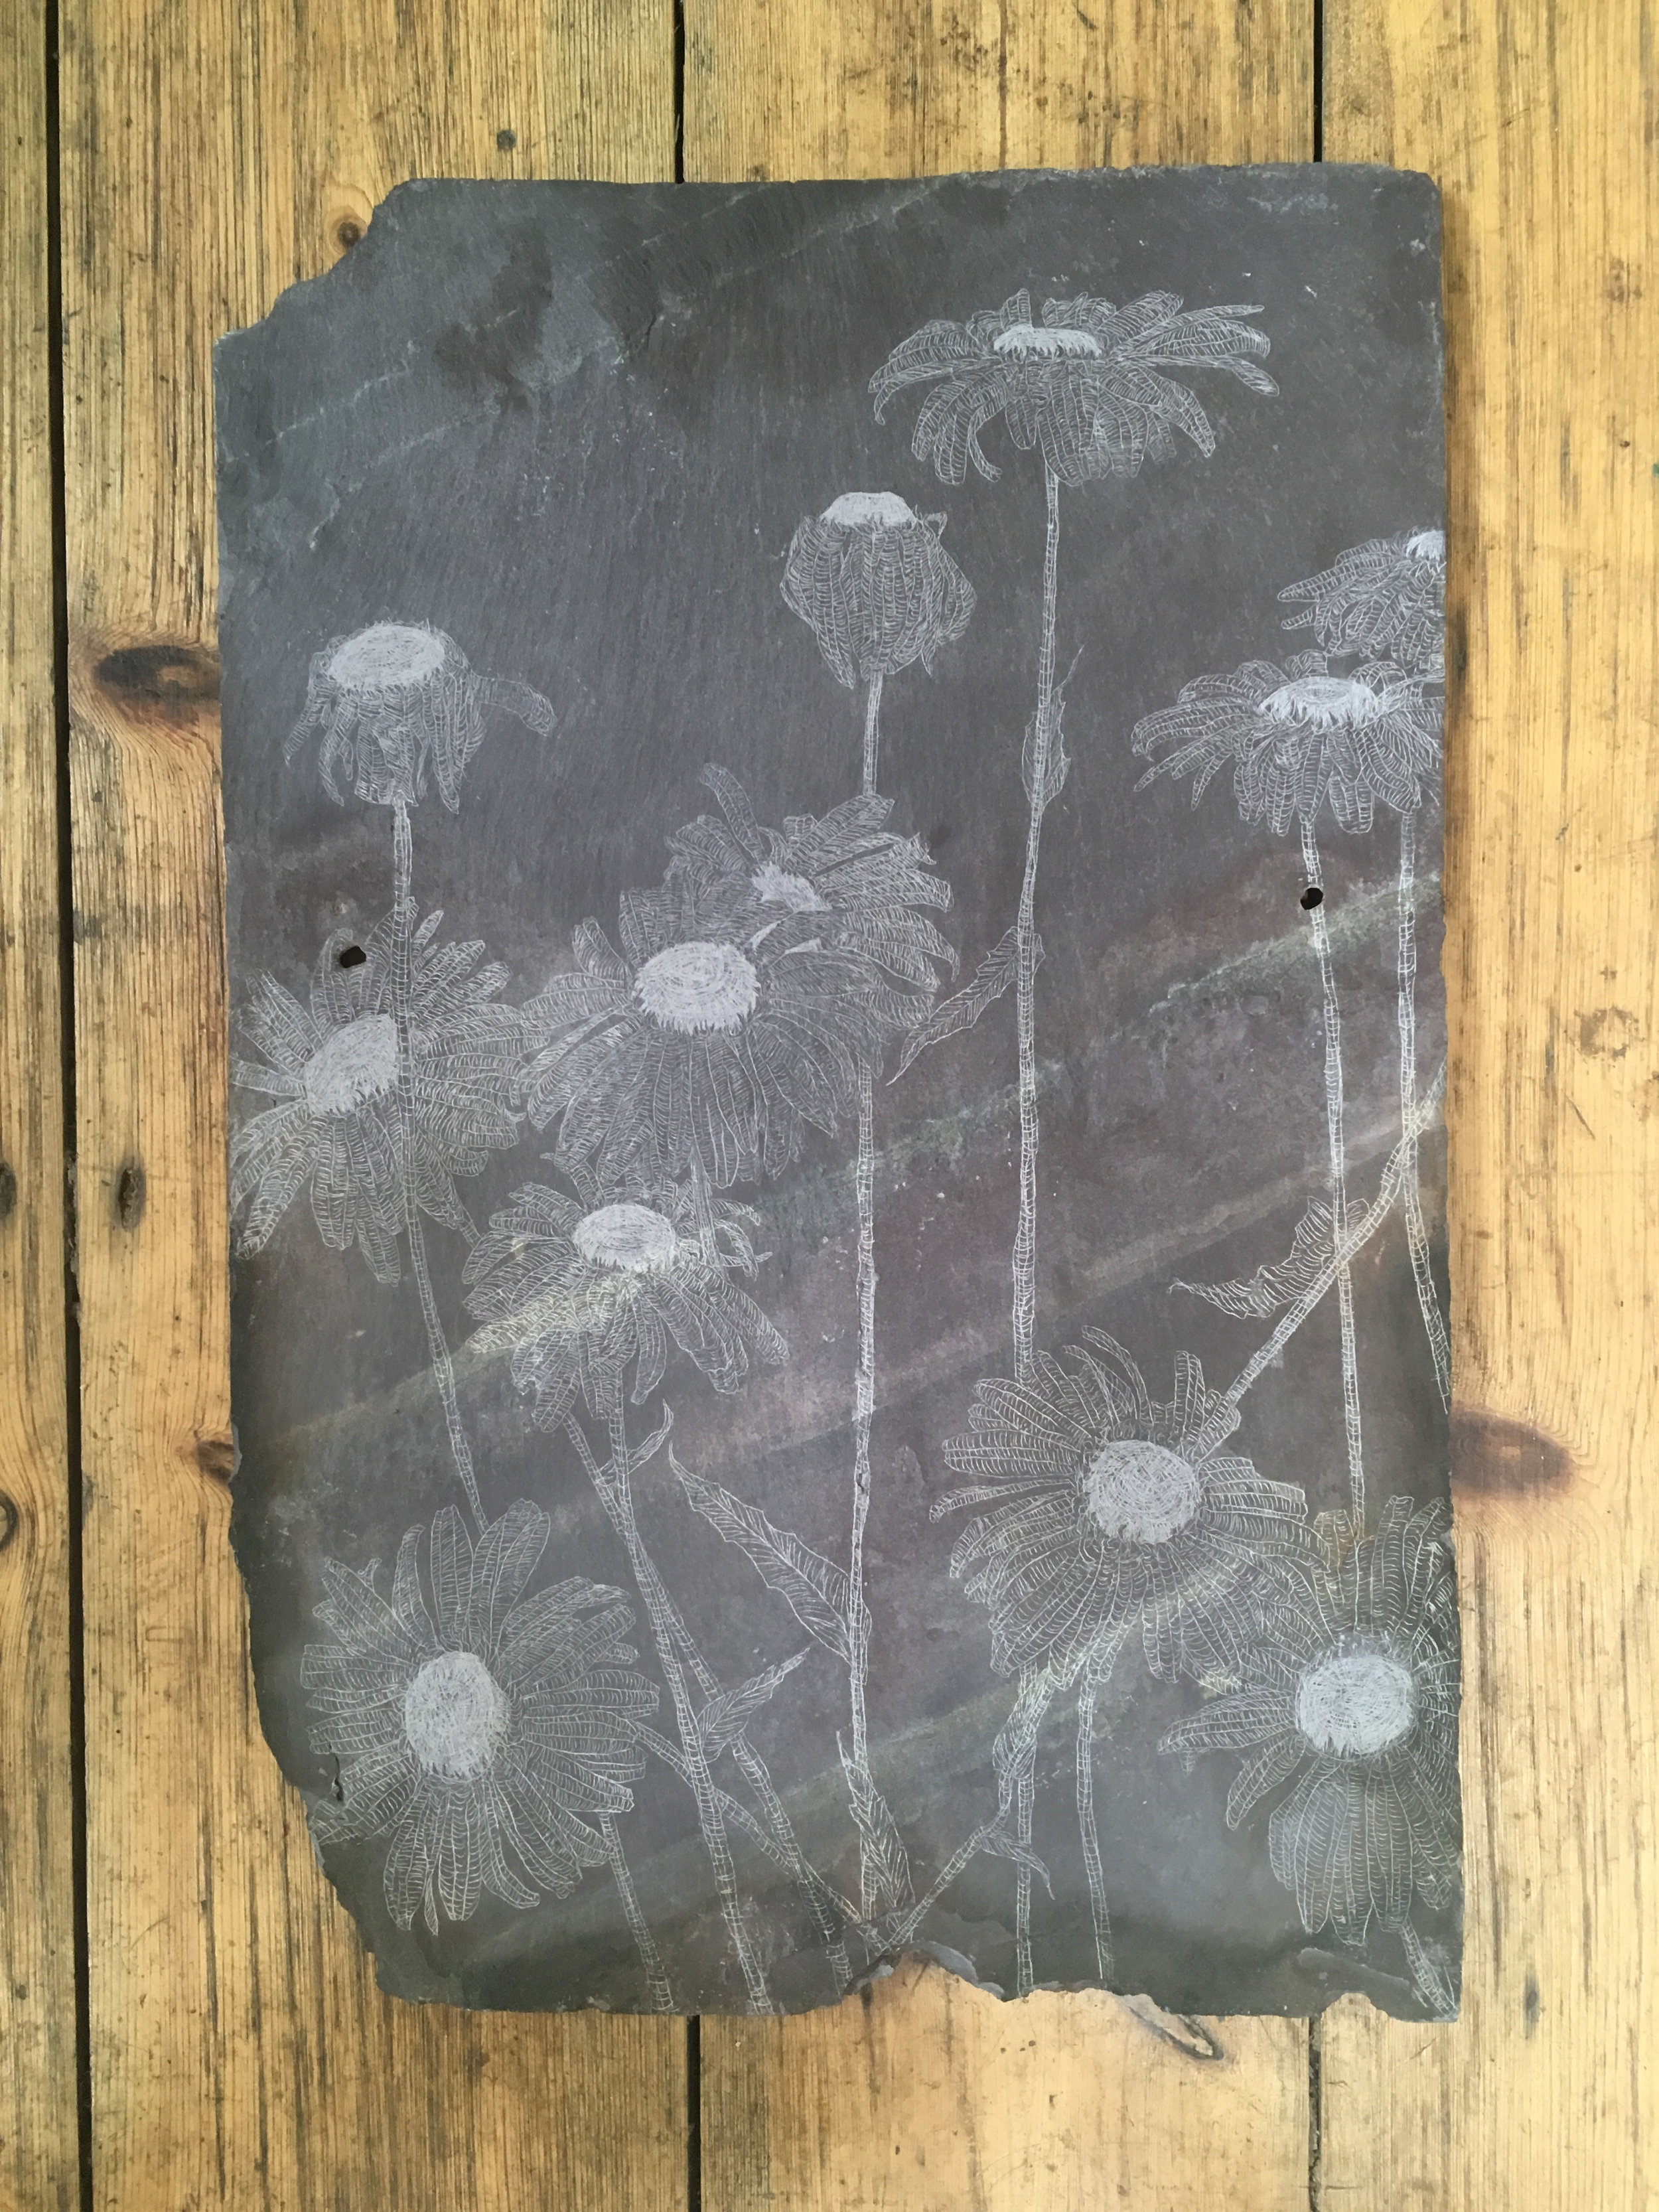 Shasta Daisy, Slate Engraving.